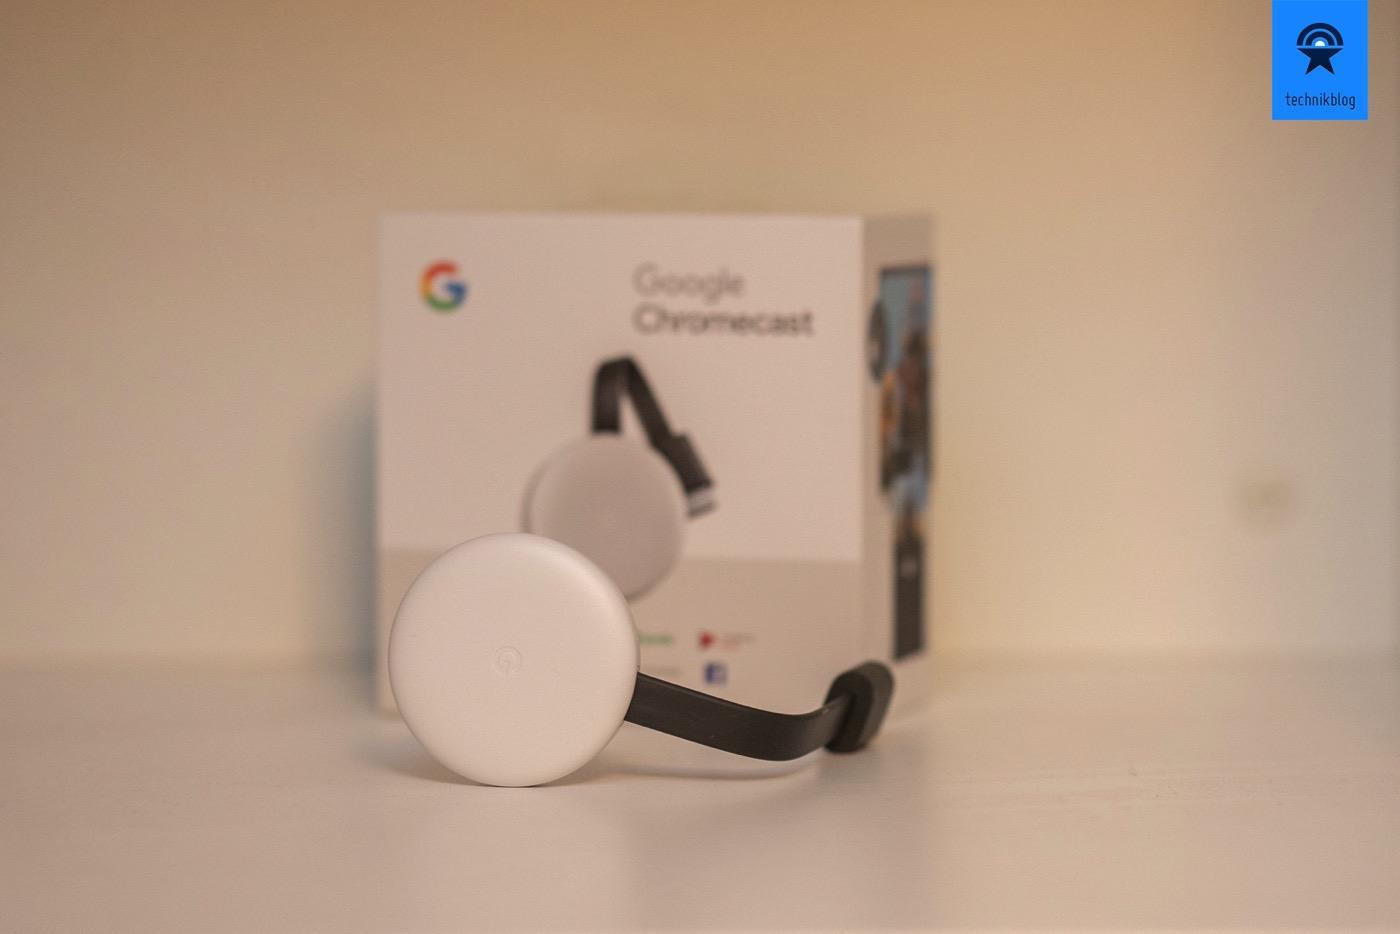 Neuer Google Chromecast im Test